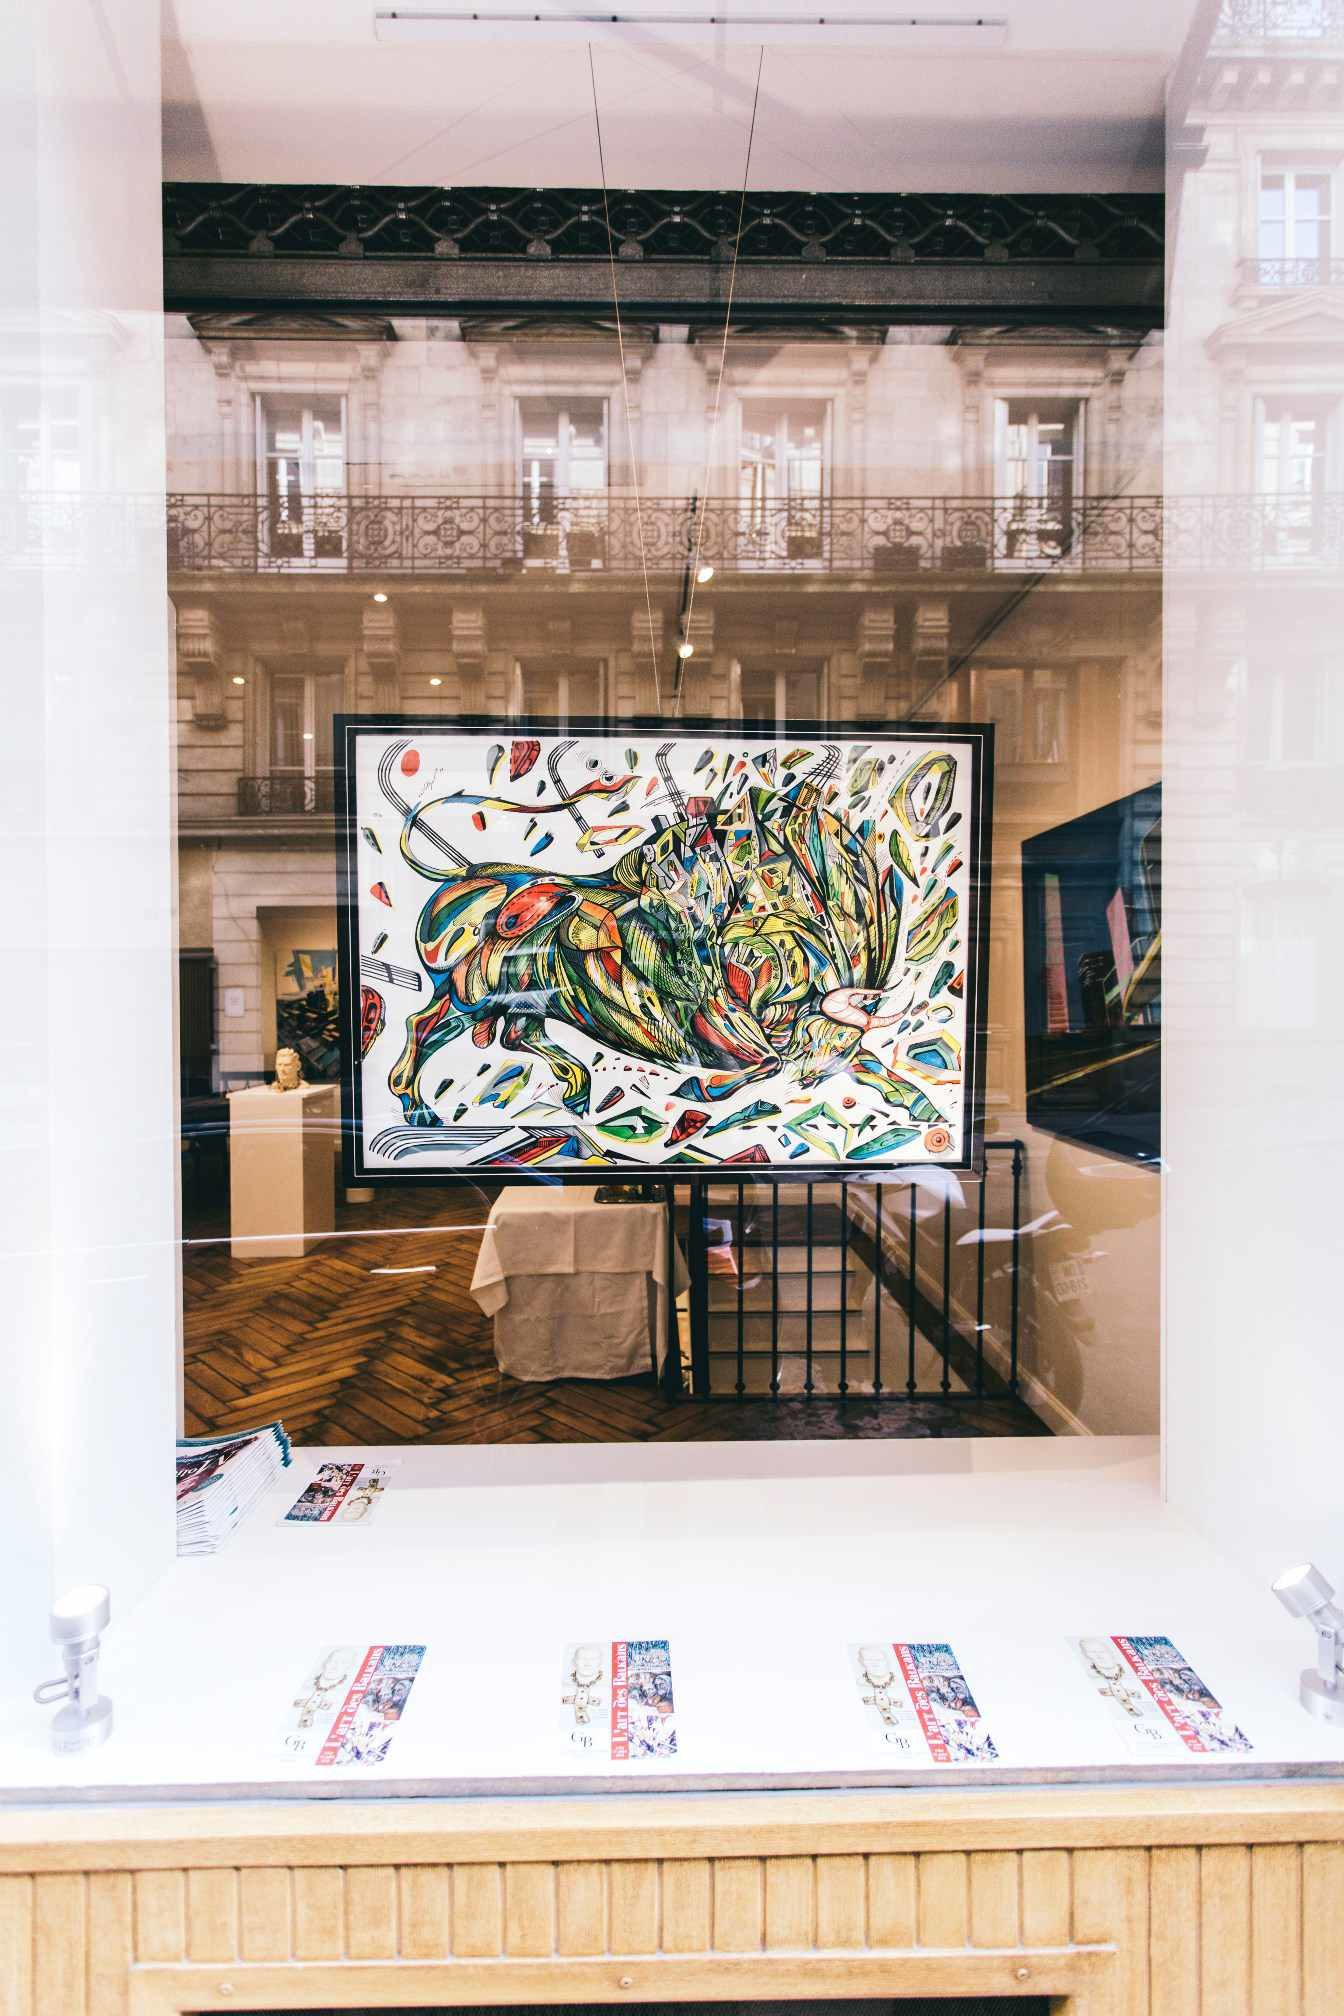 L'art des Balkans at Galerie Boris, Marko Gavrilovic